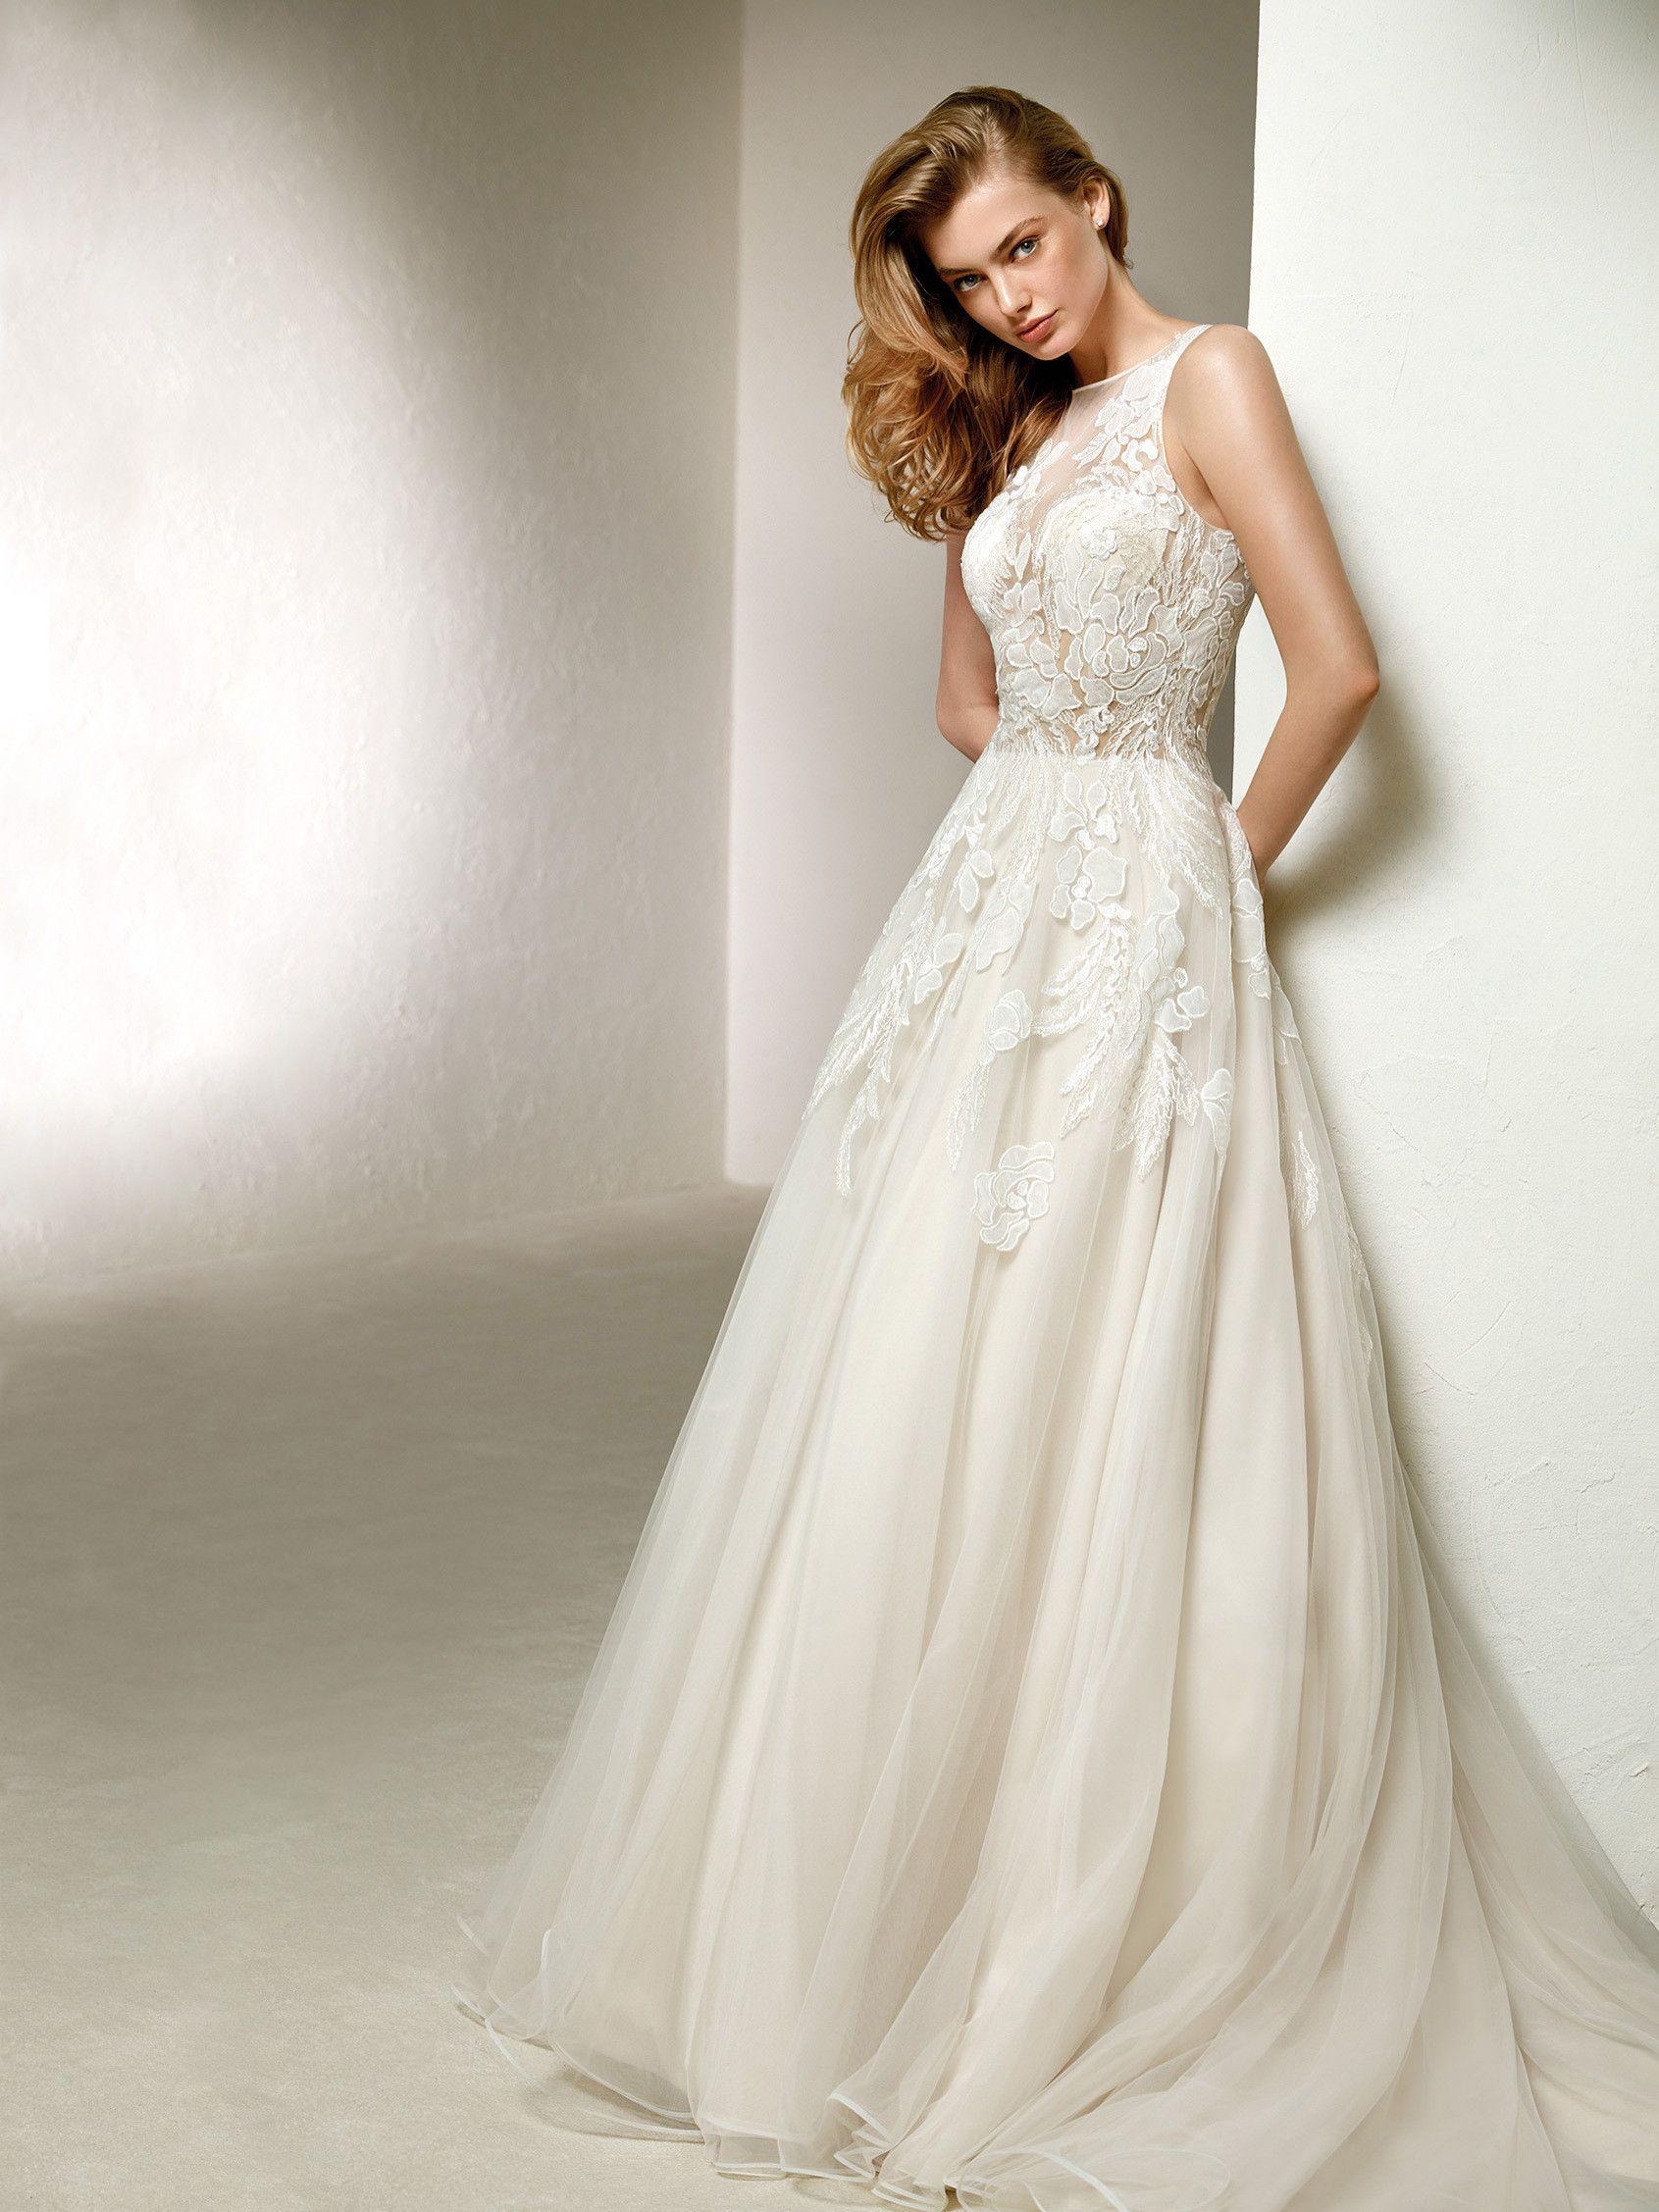 DOLA Off White/Beige Size 8 | Pronovias | Pinterest | Wedding dress ...